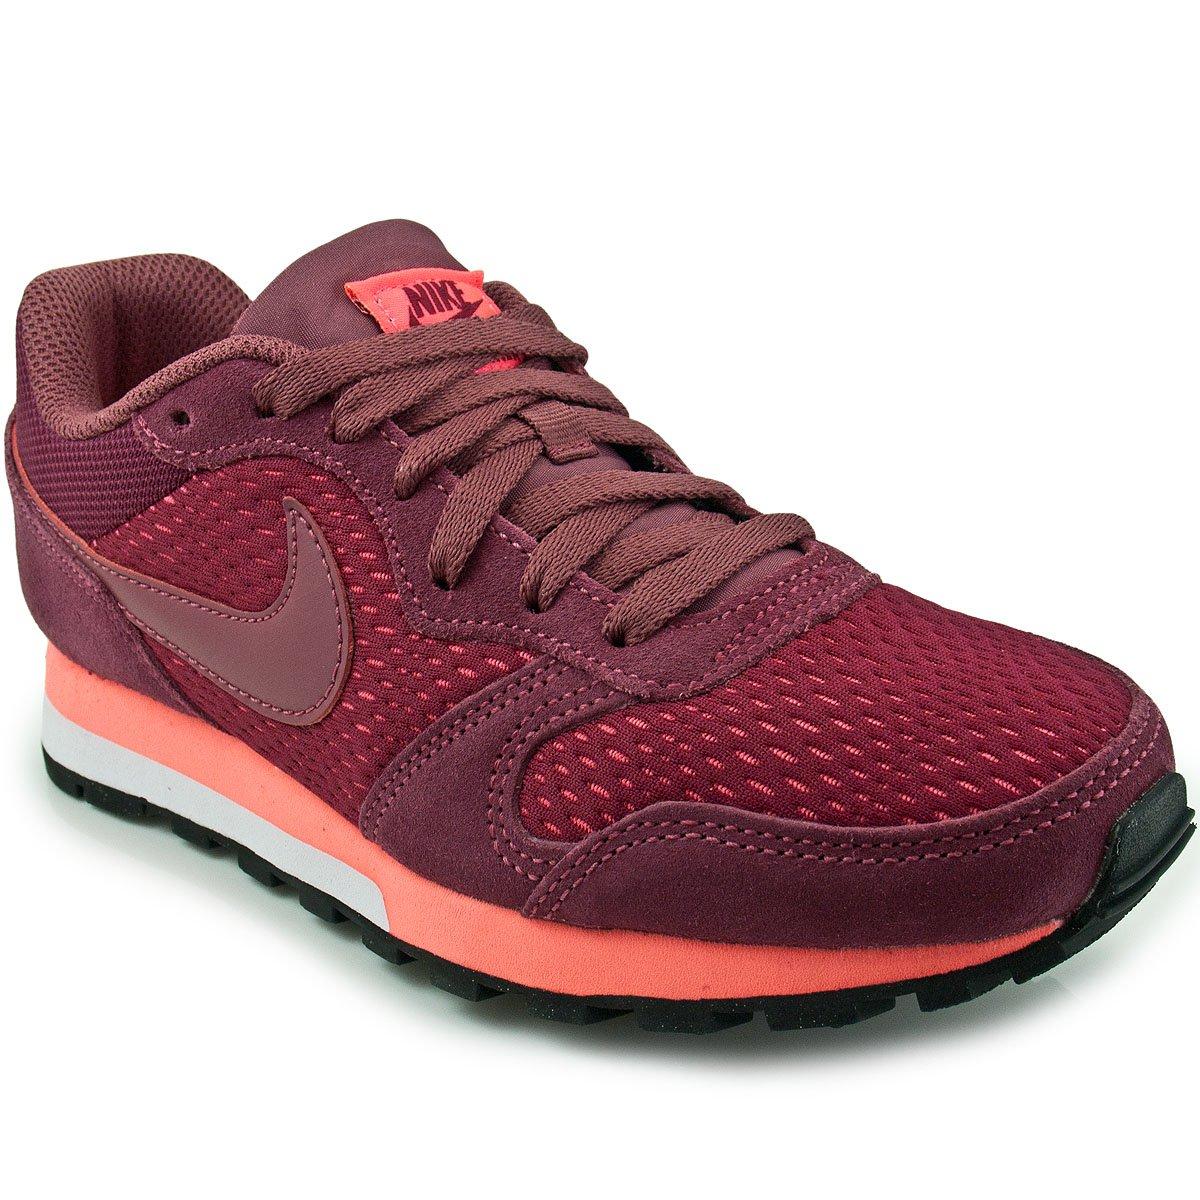 0b8a78de8ec Tênis Nike MD Runner 2 W 749869